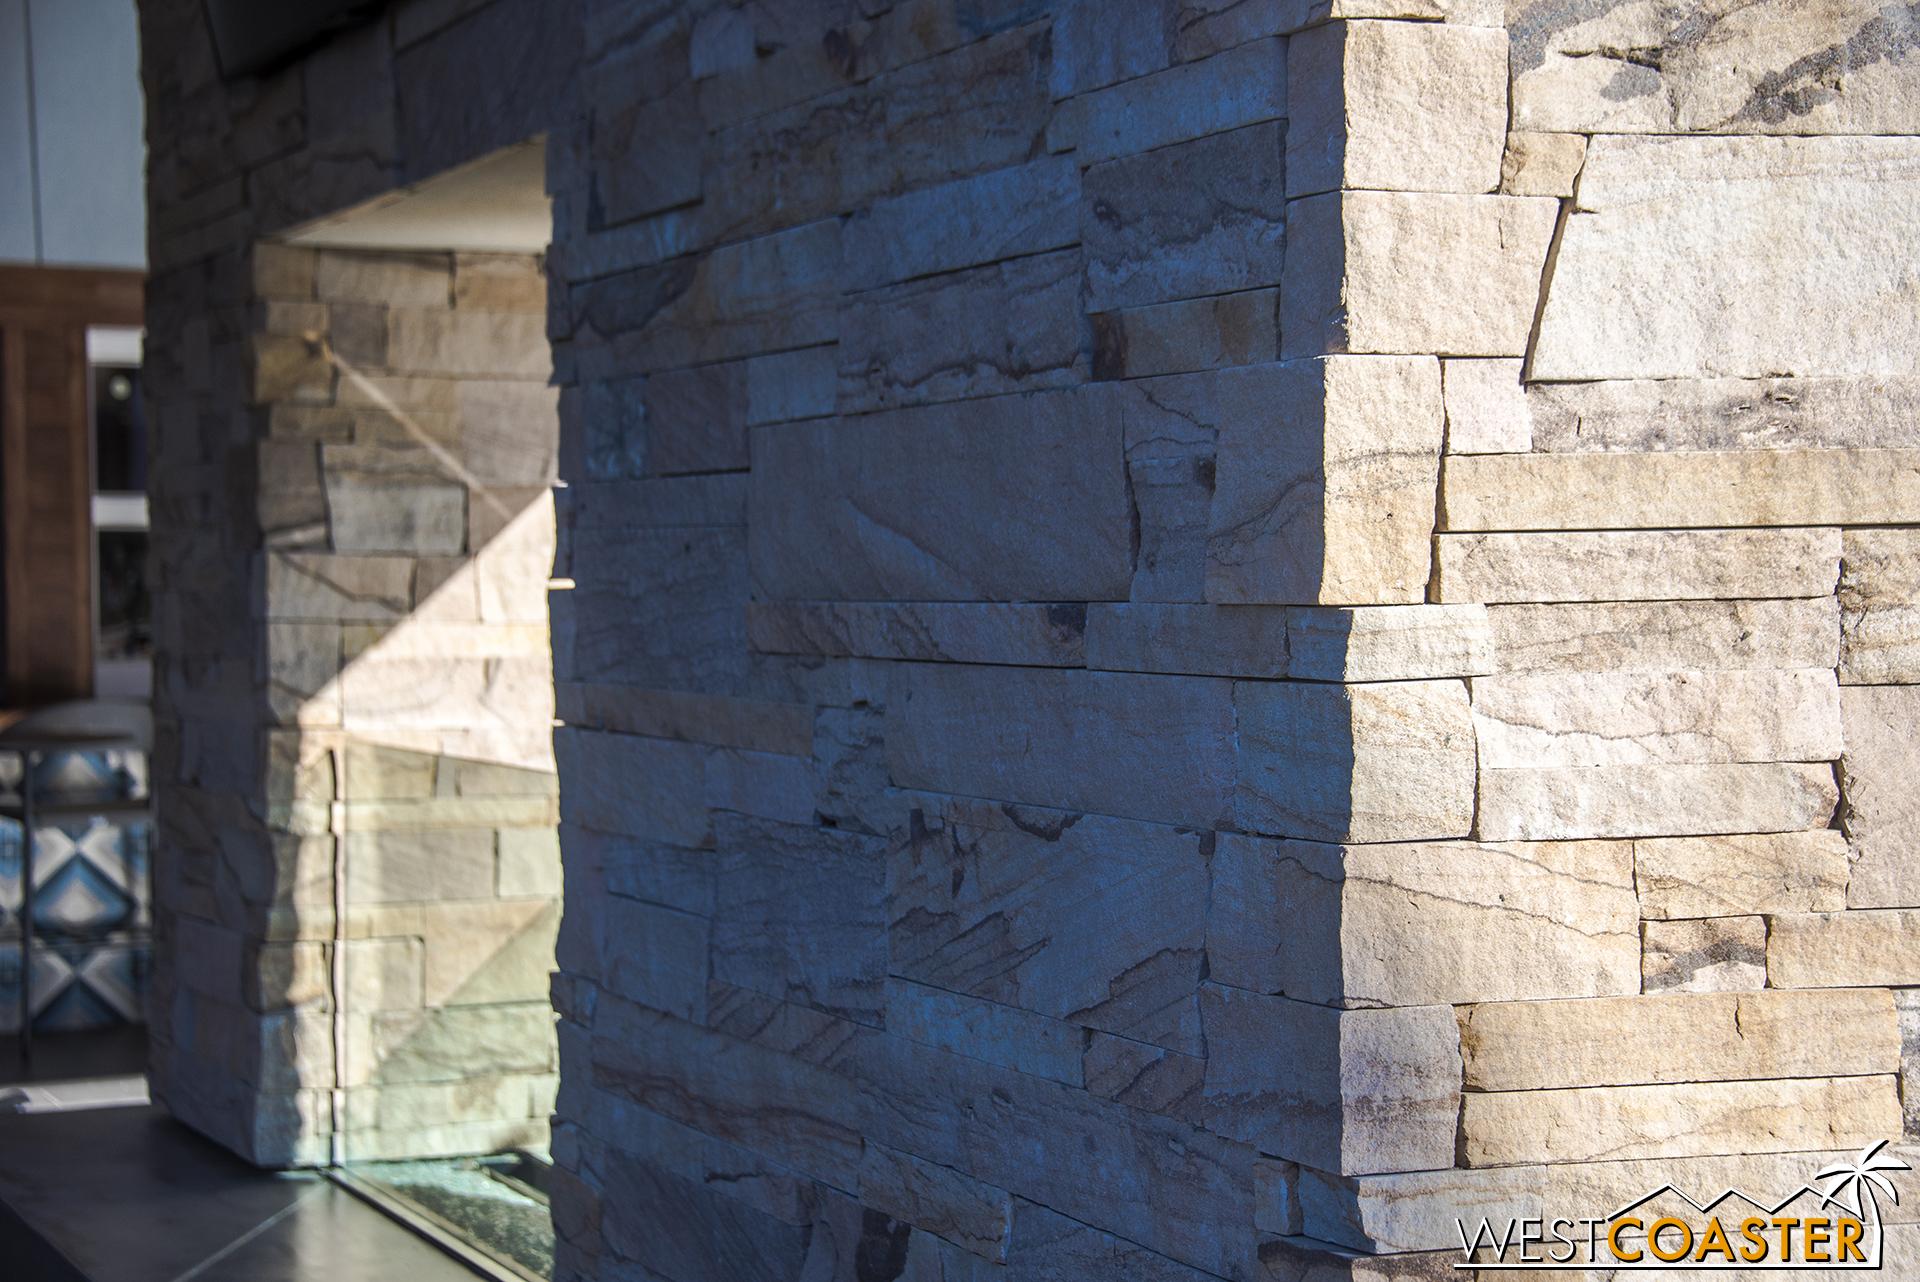 The stone veneer looks pretty.